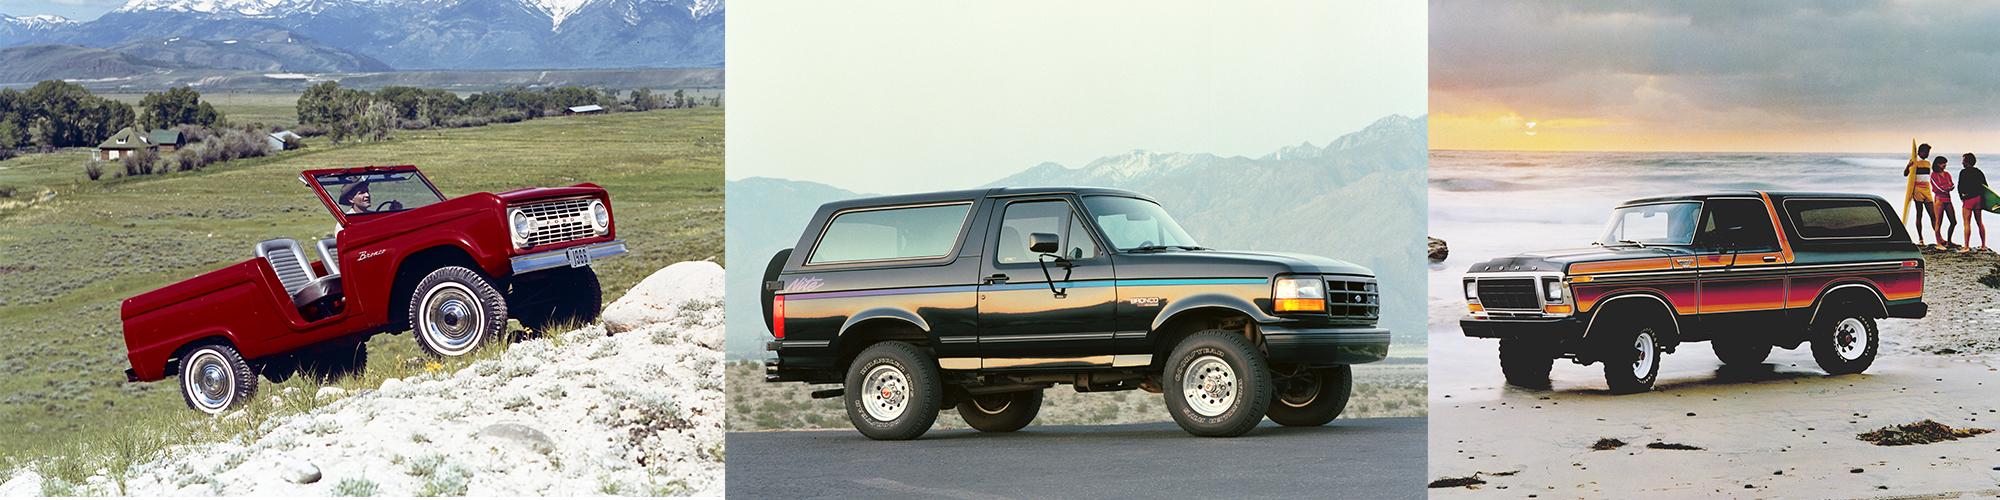 2020 Ford Bronco News